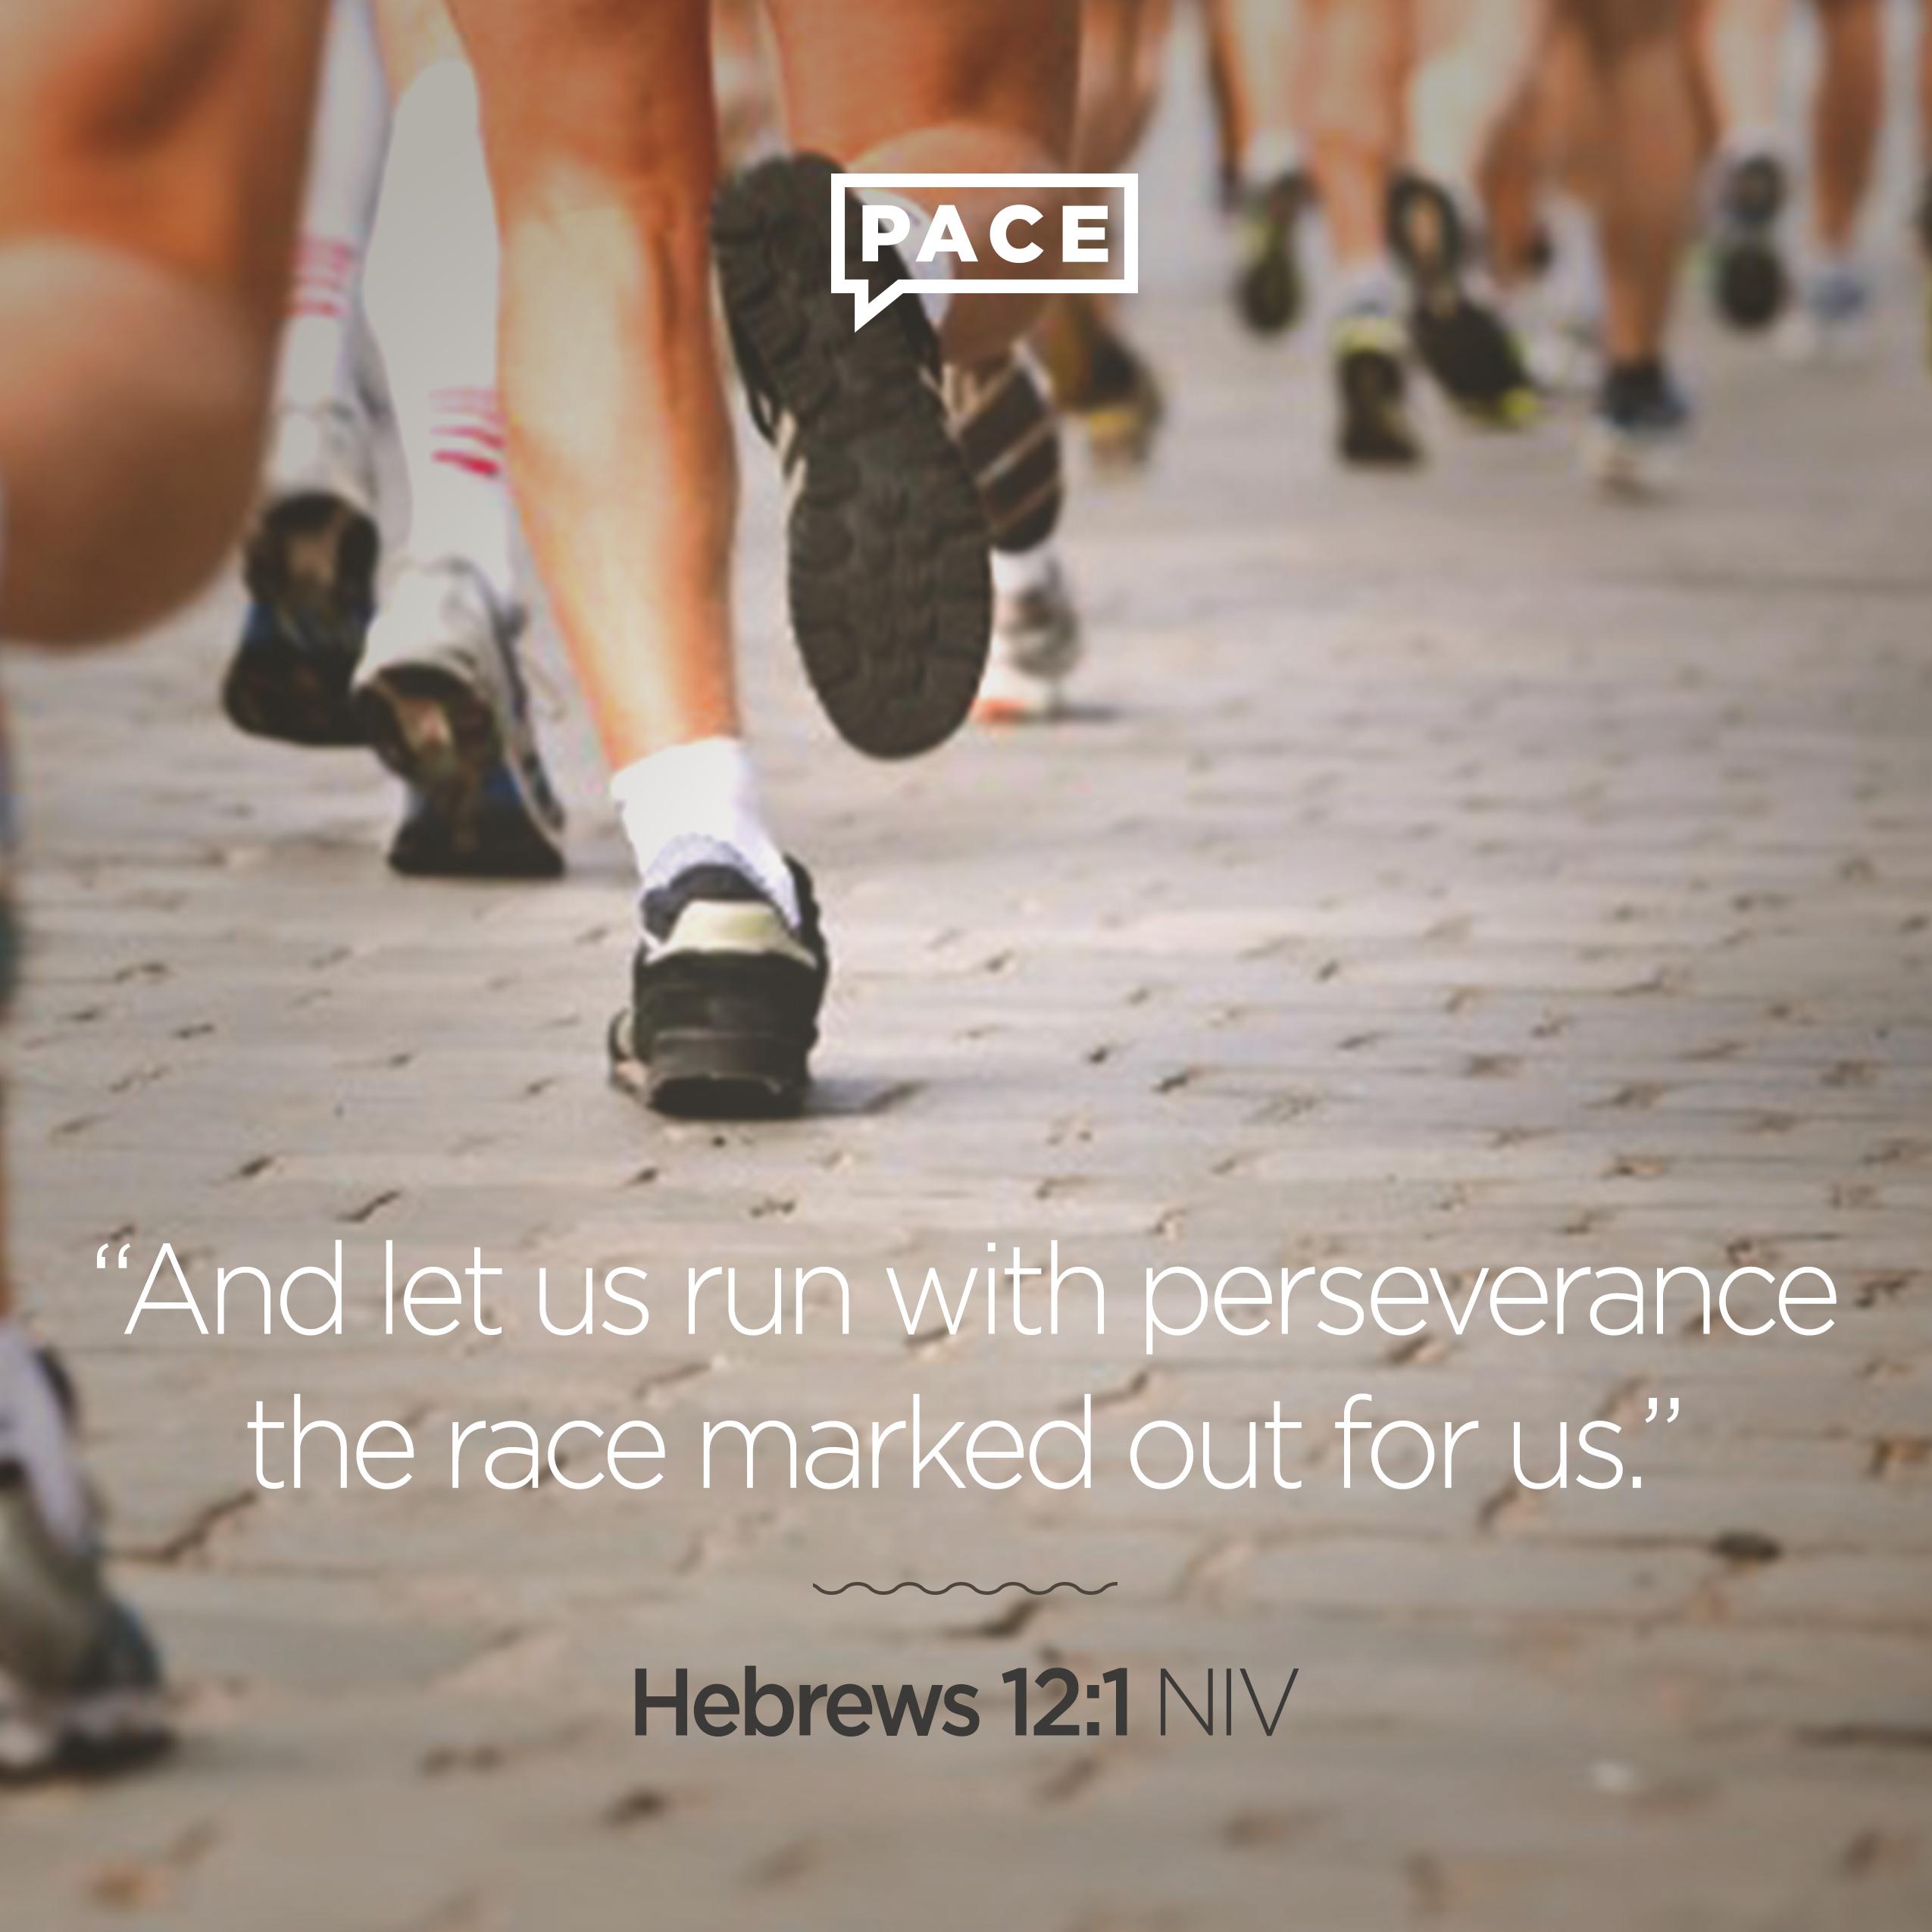 Race (JPG)